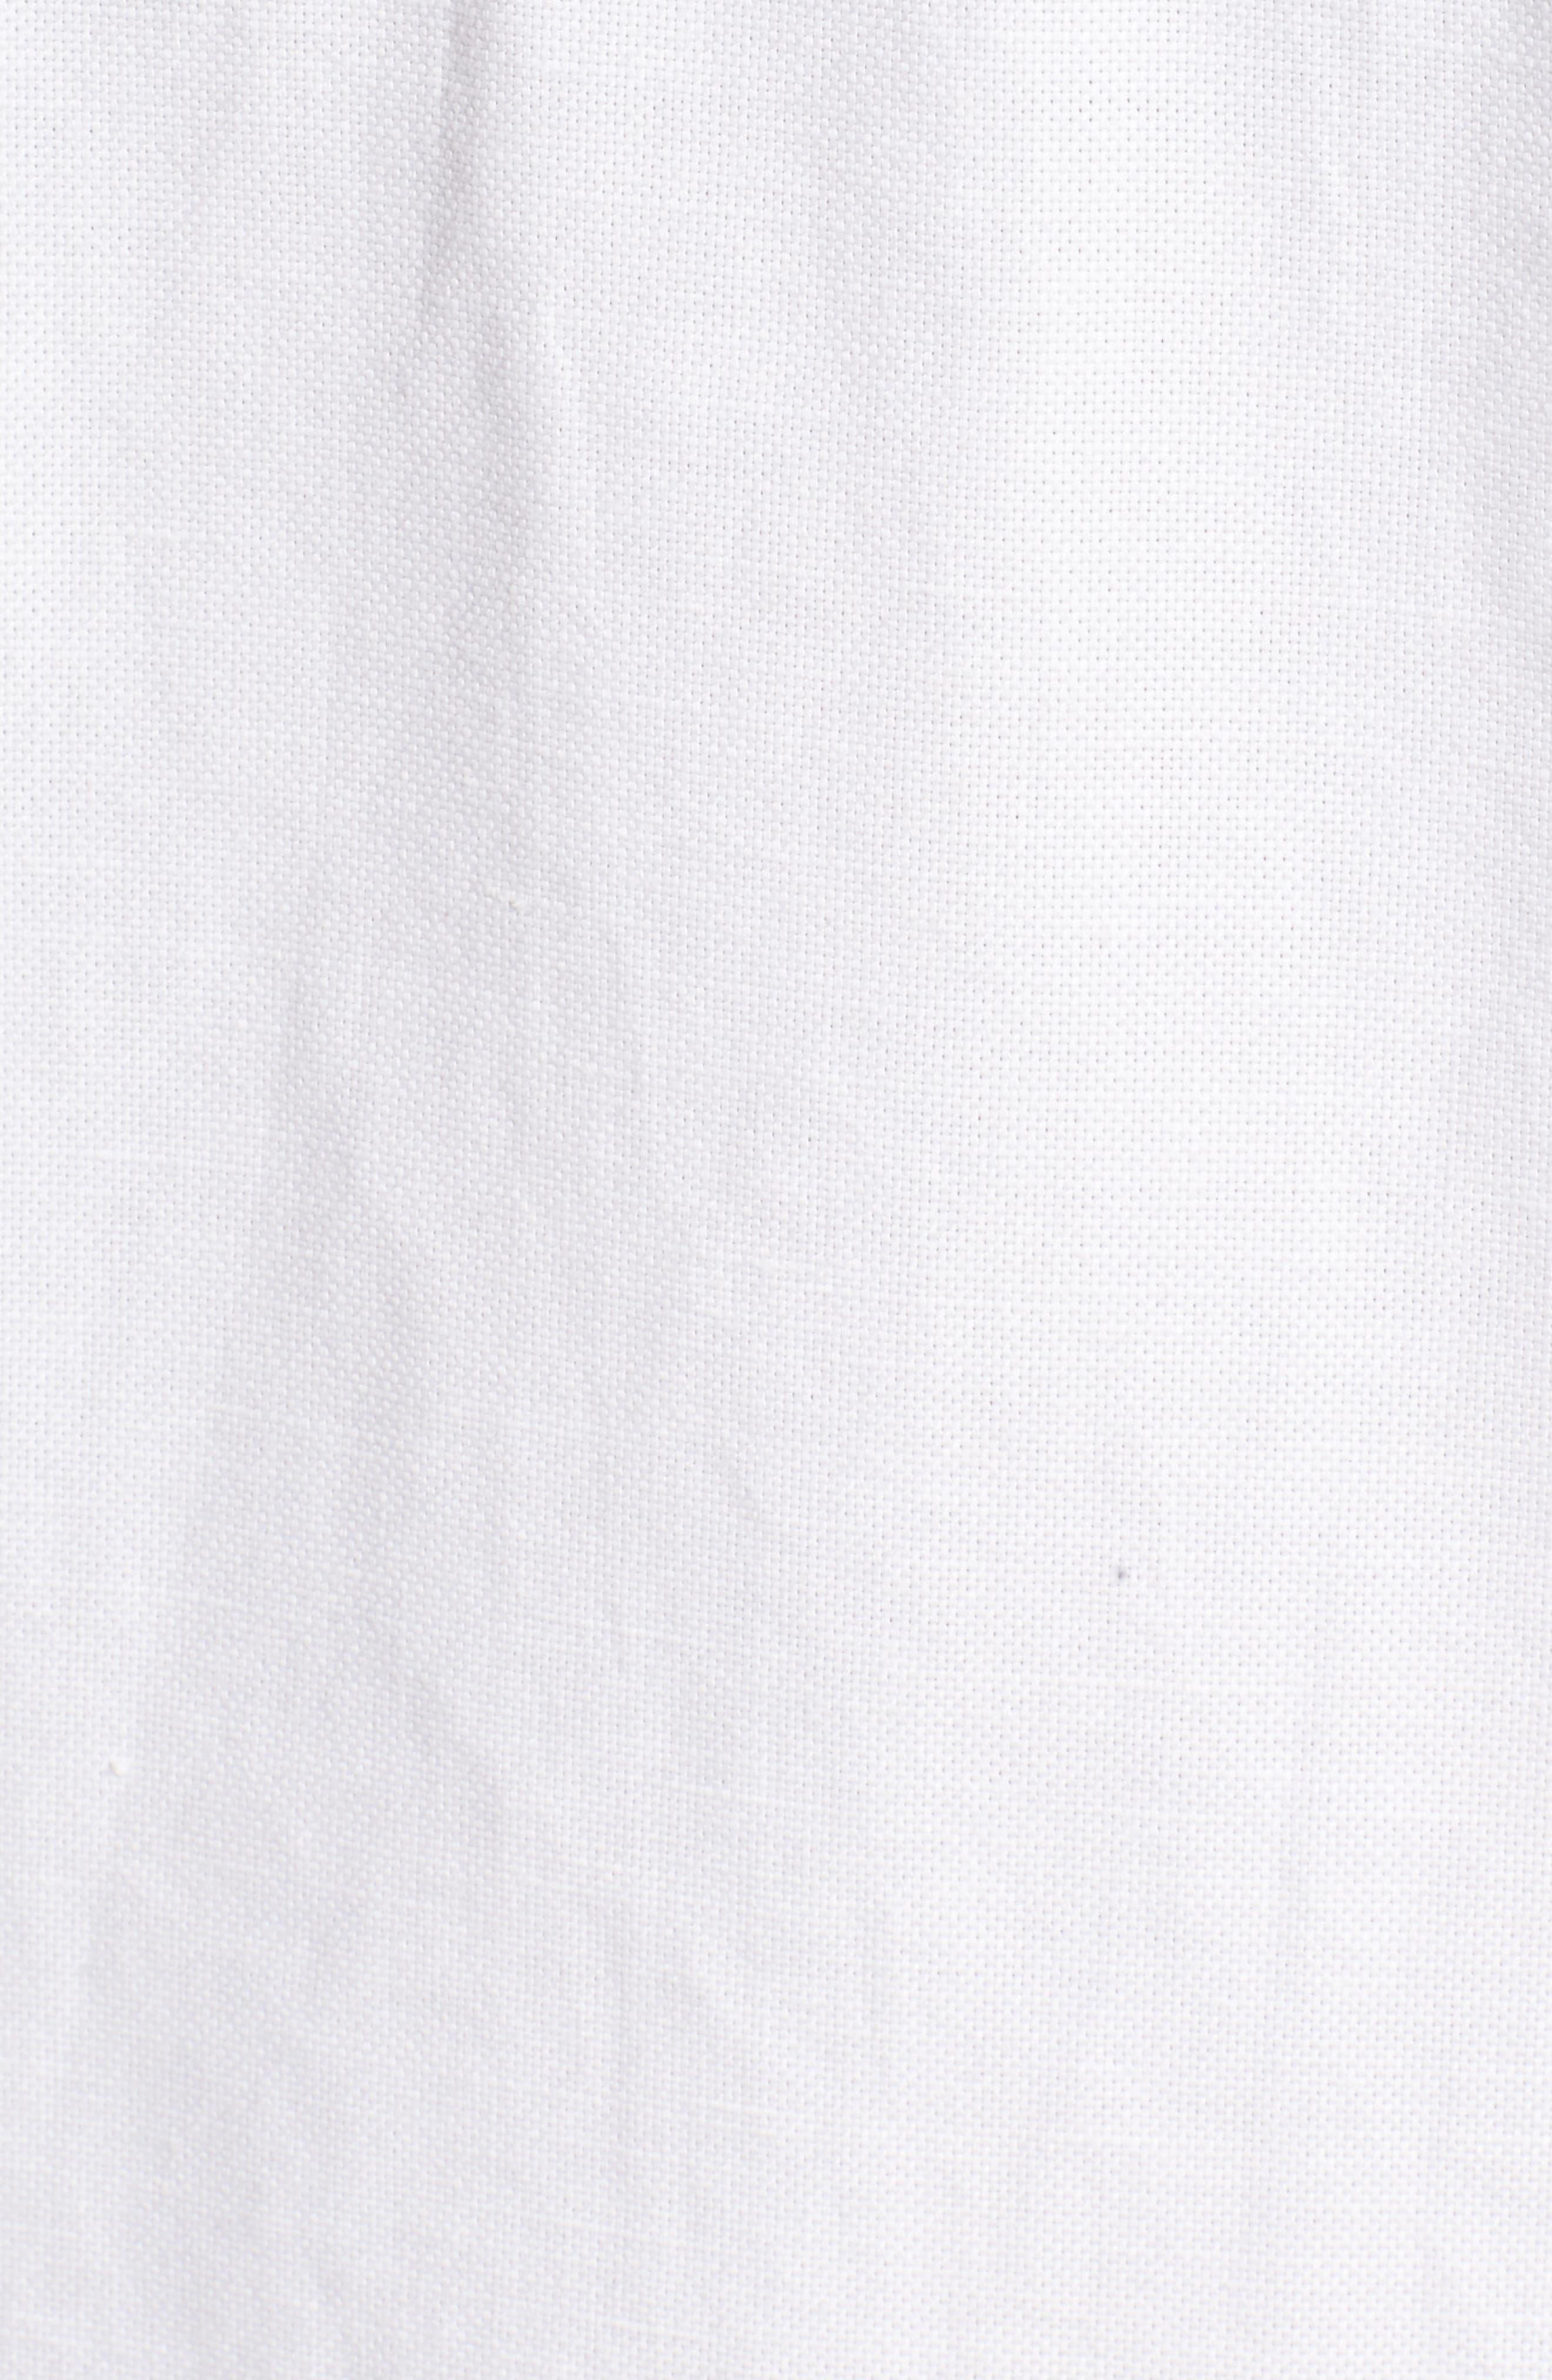 Embroidered Linen & Cotton Shift Dress,                             Alternate thumbnail 5, color,                             Bedouin Sand